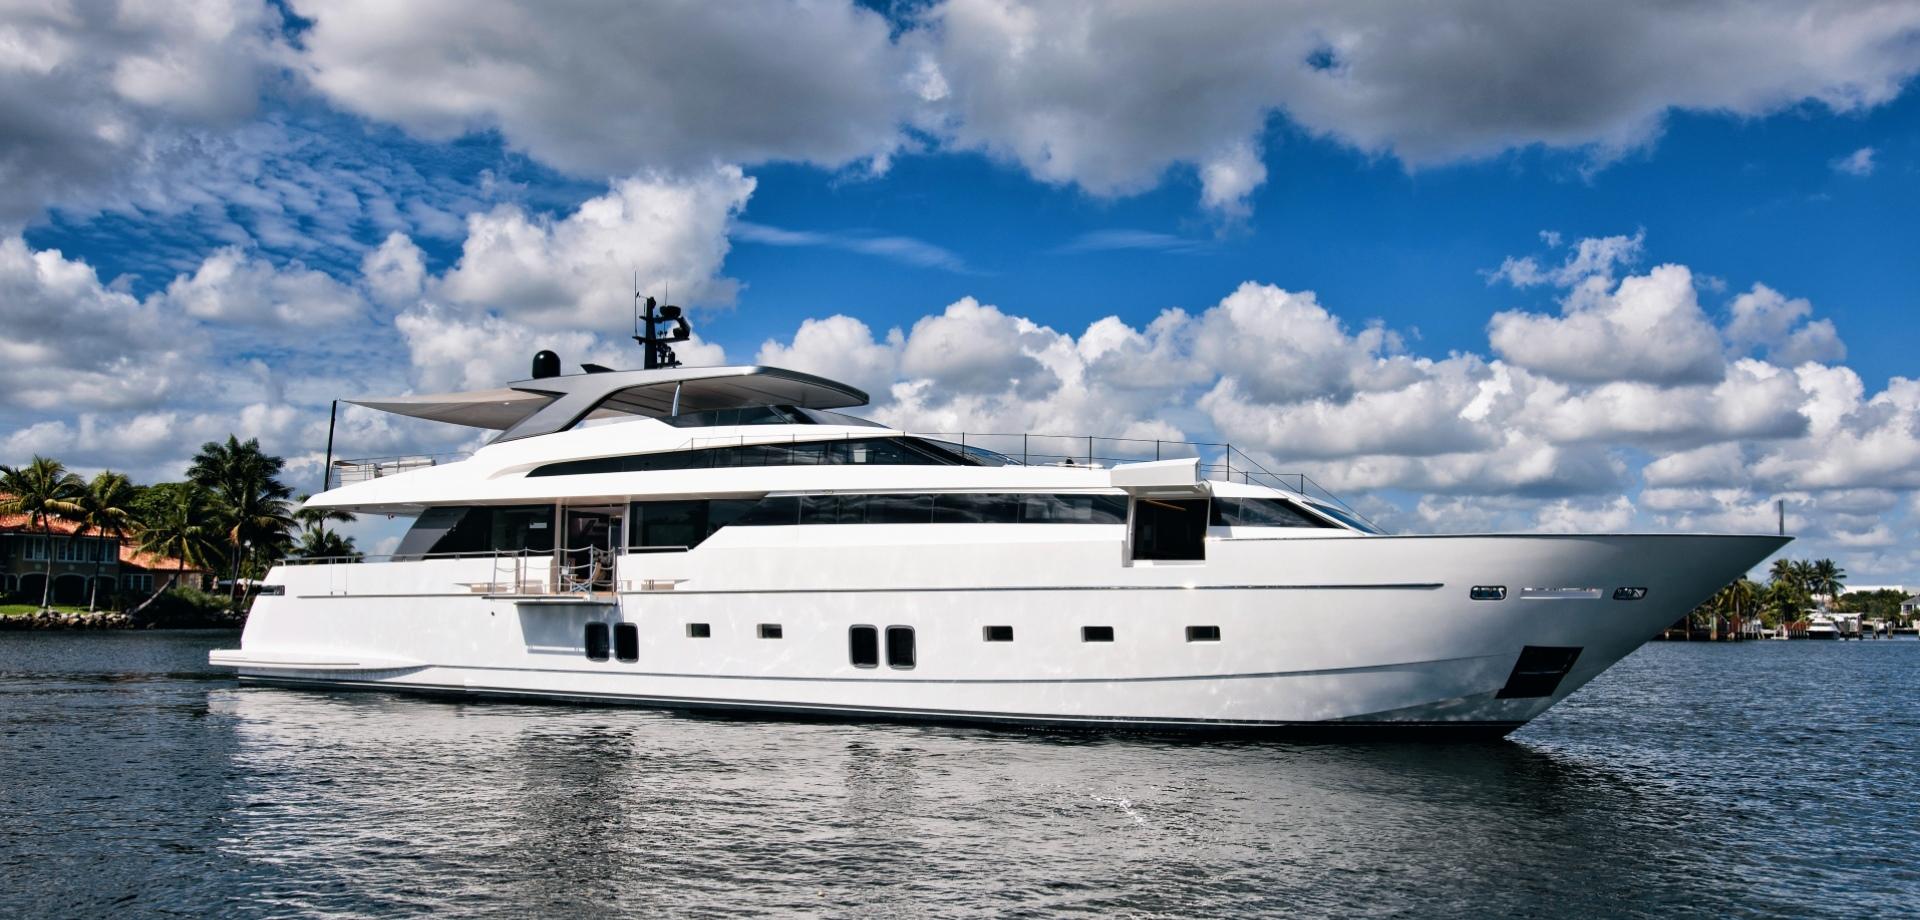 Motor Yacht Haiia